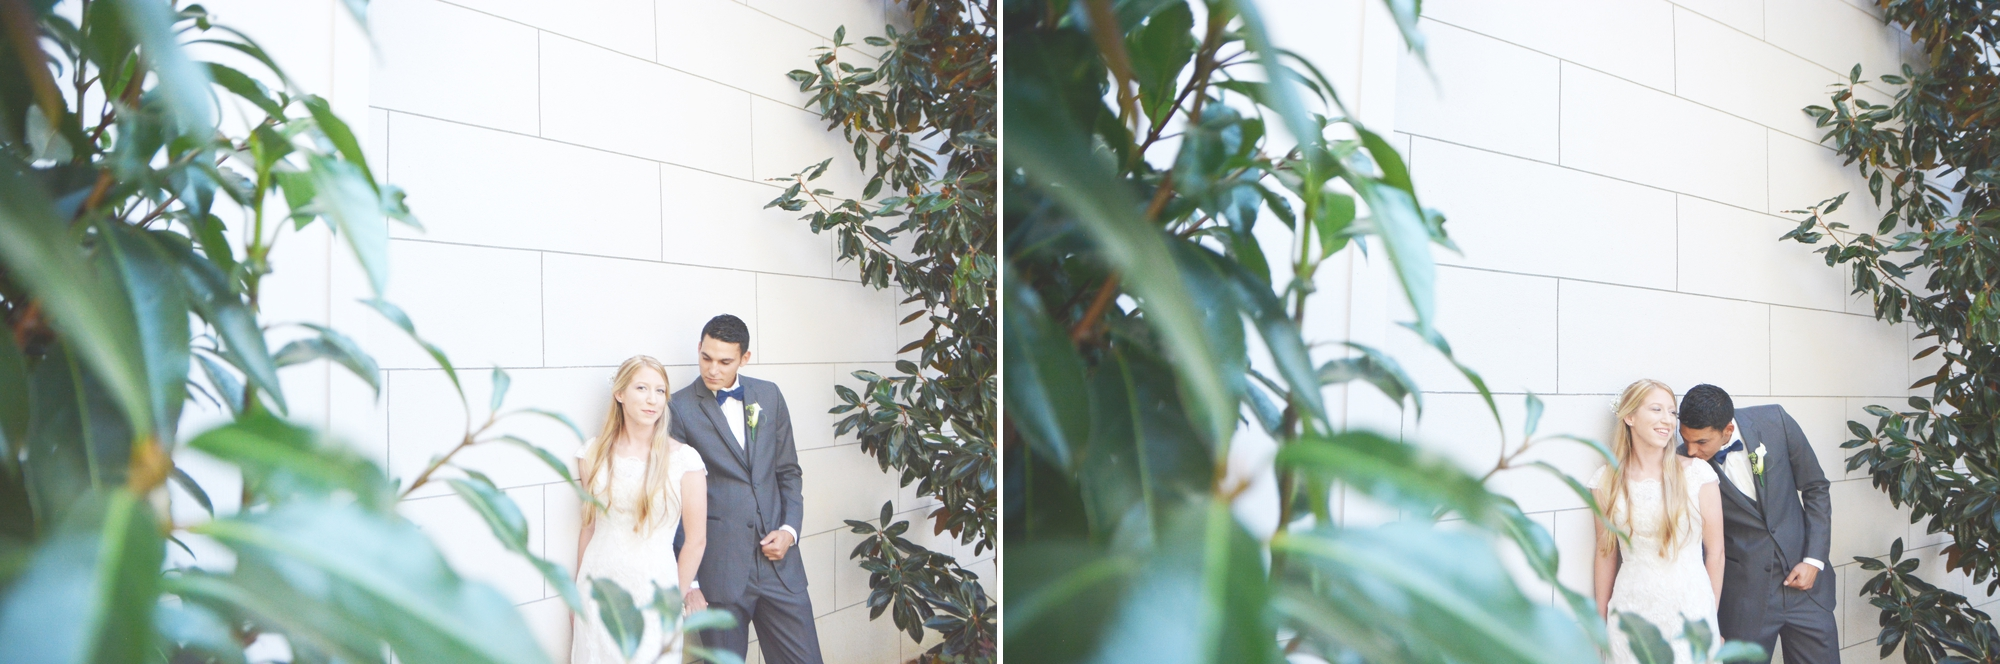 tate-house-wedding-six-hearts-photography032